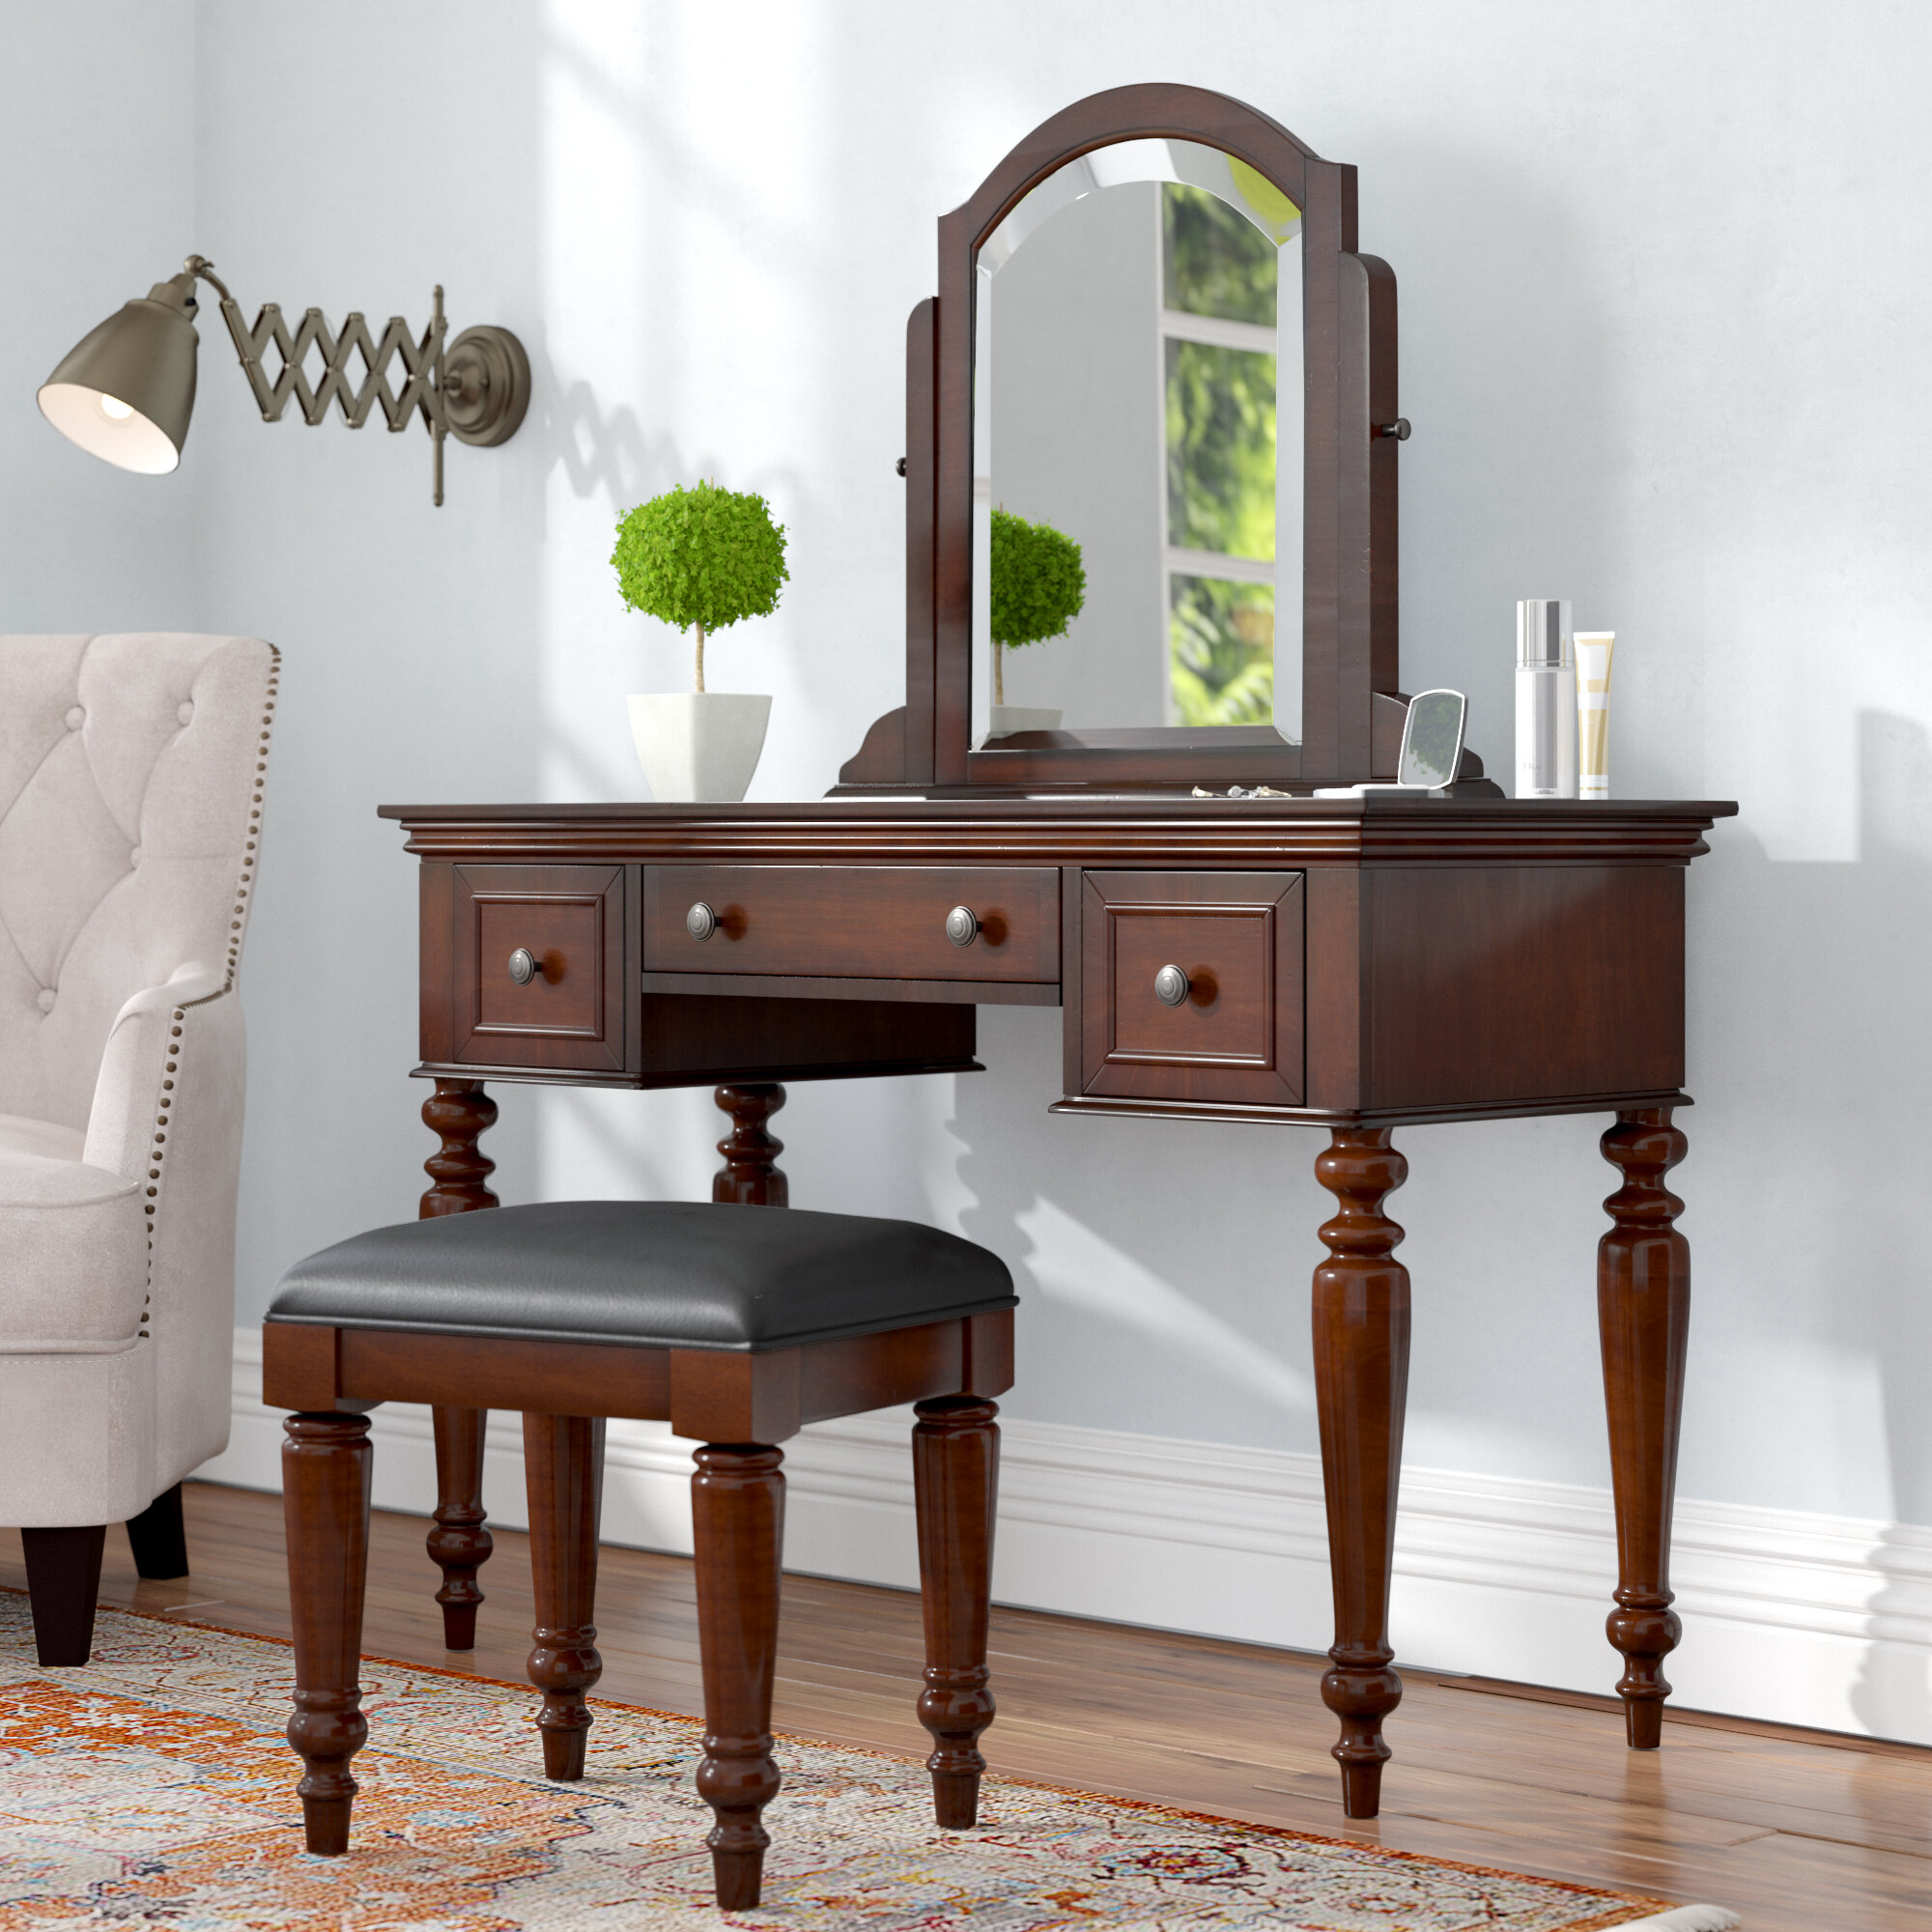 Astoria Grand Rossie Vanity Set With Stool And Mirror Reviews Wayfair